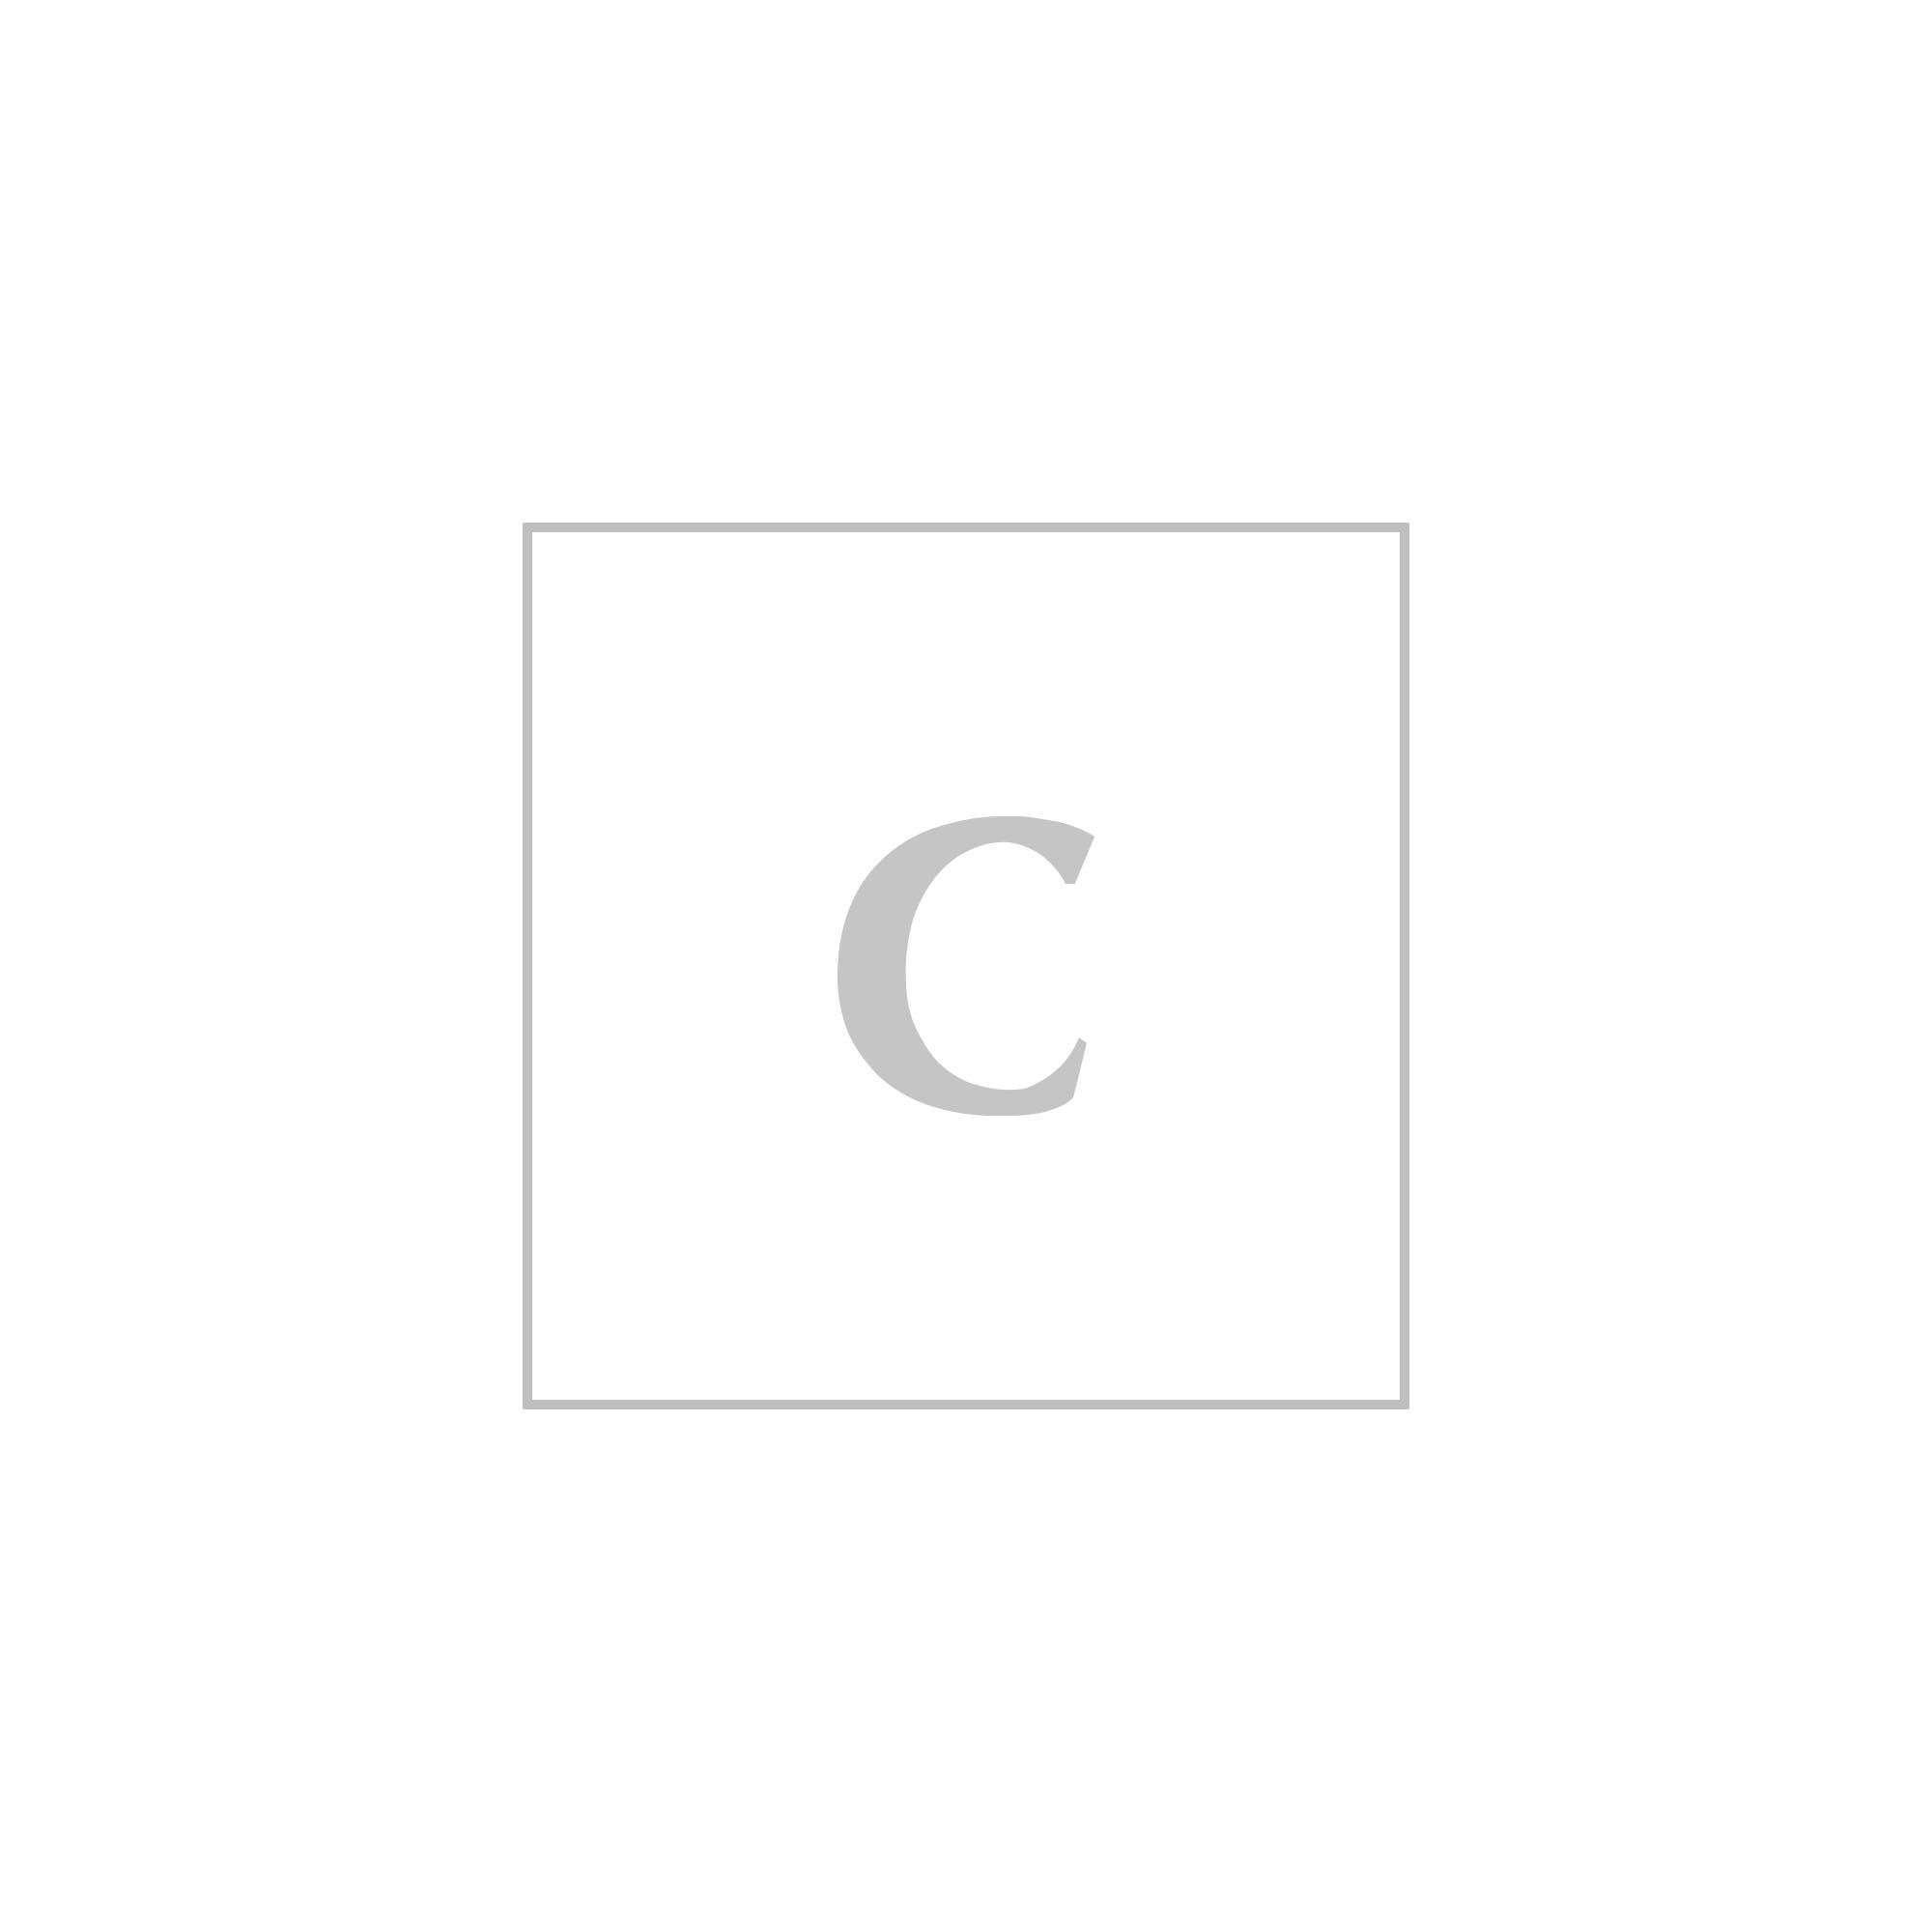 finest selection 99634 13ce6 Moncler Basic Piumini da Donna Rosso